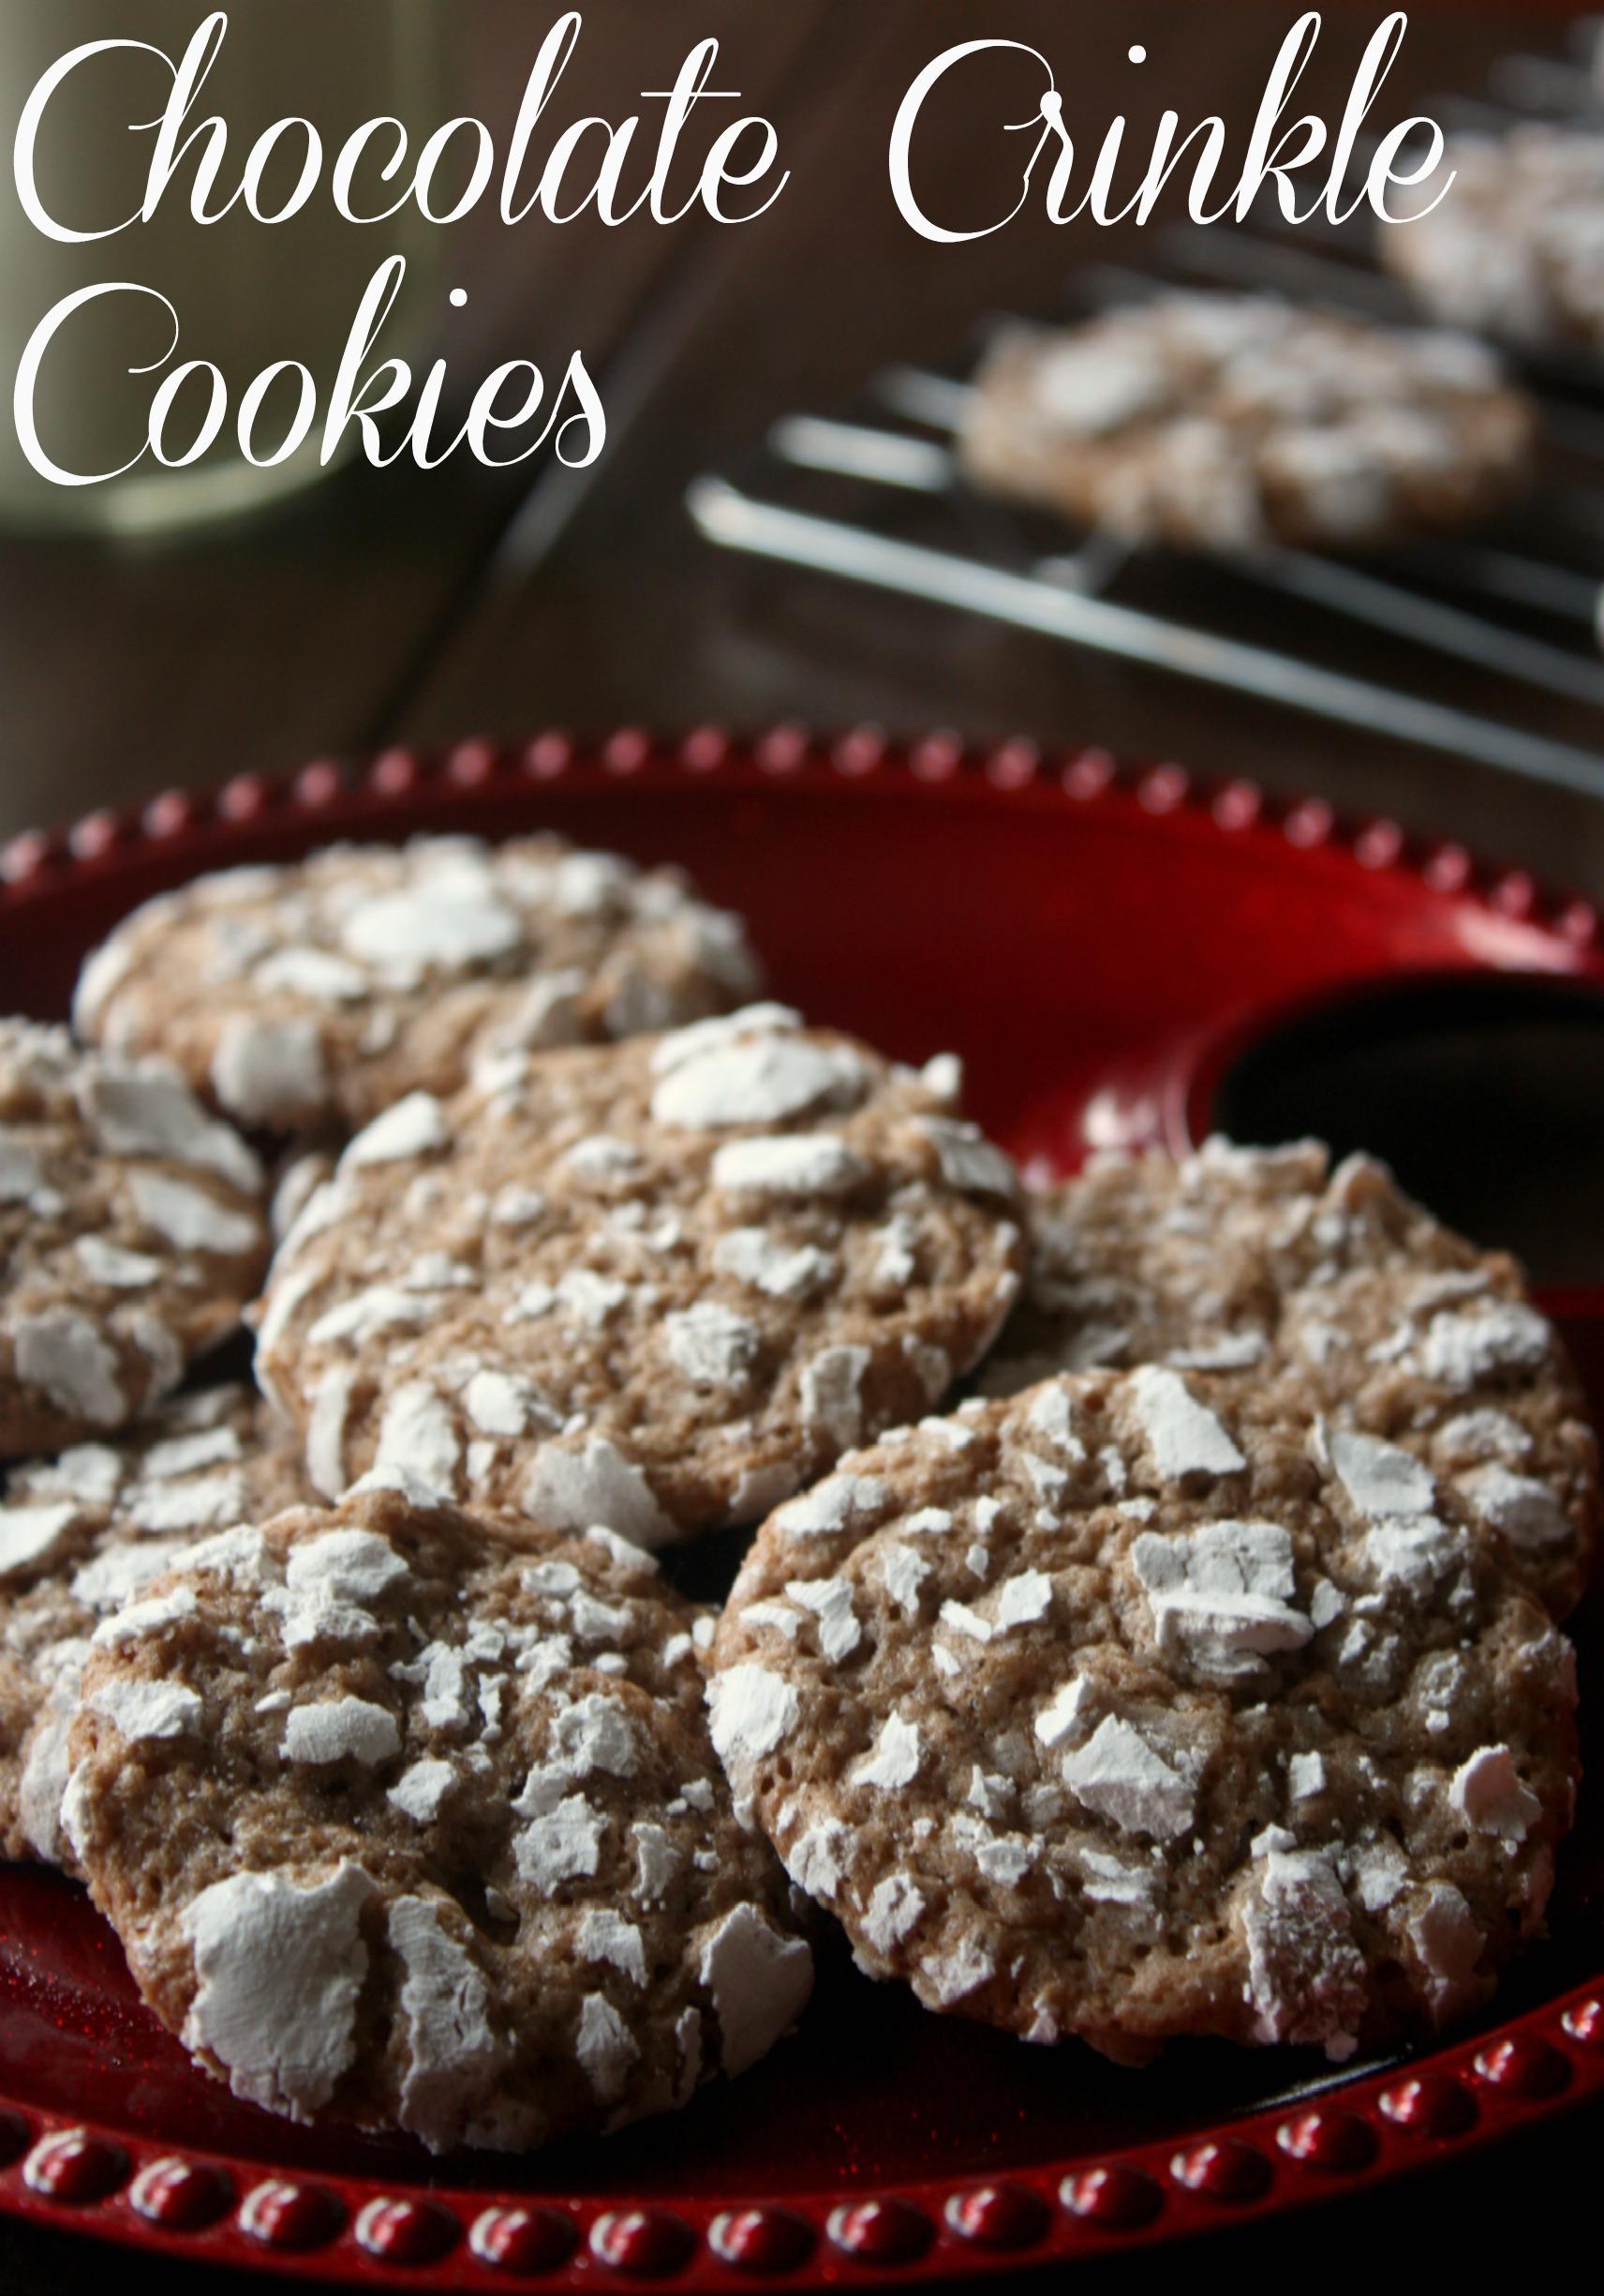 Chocolate Crinkle Cookies My Grandmother Made